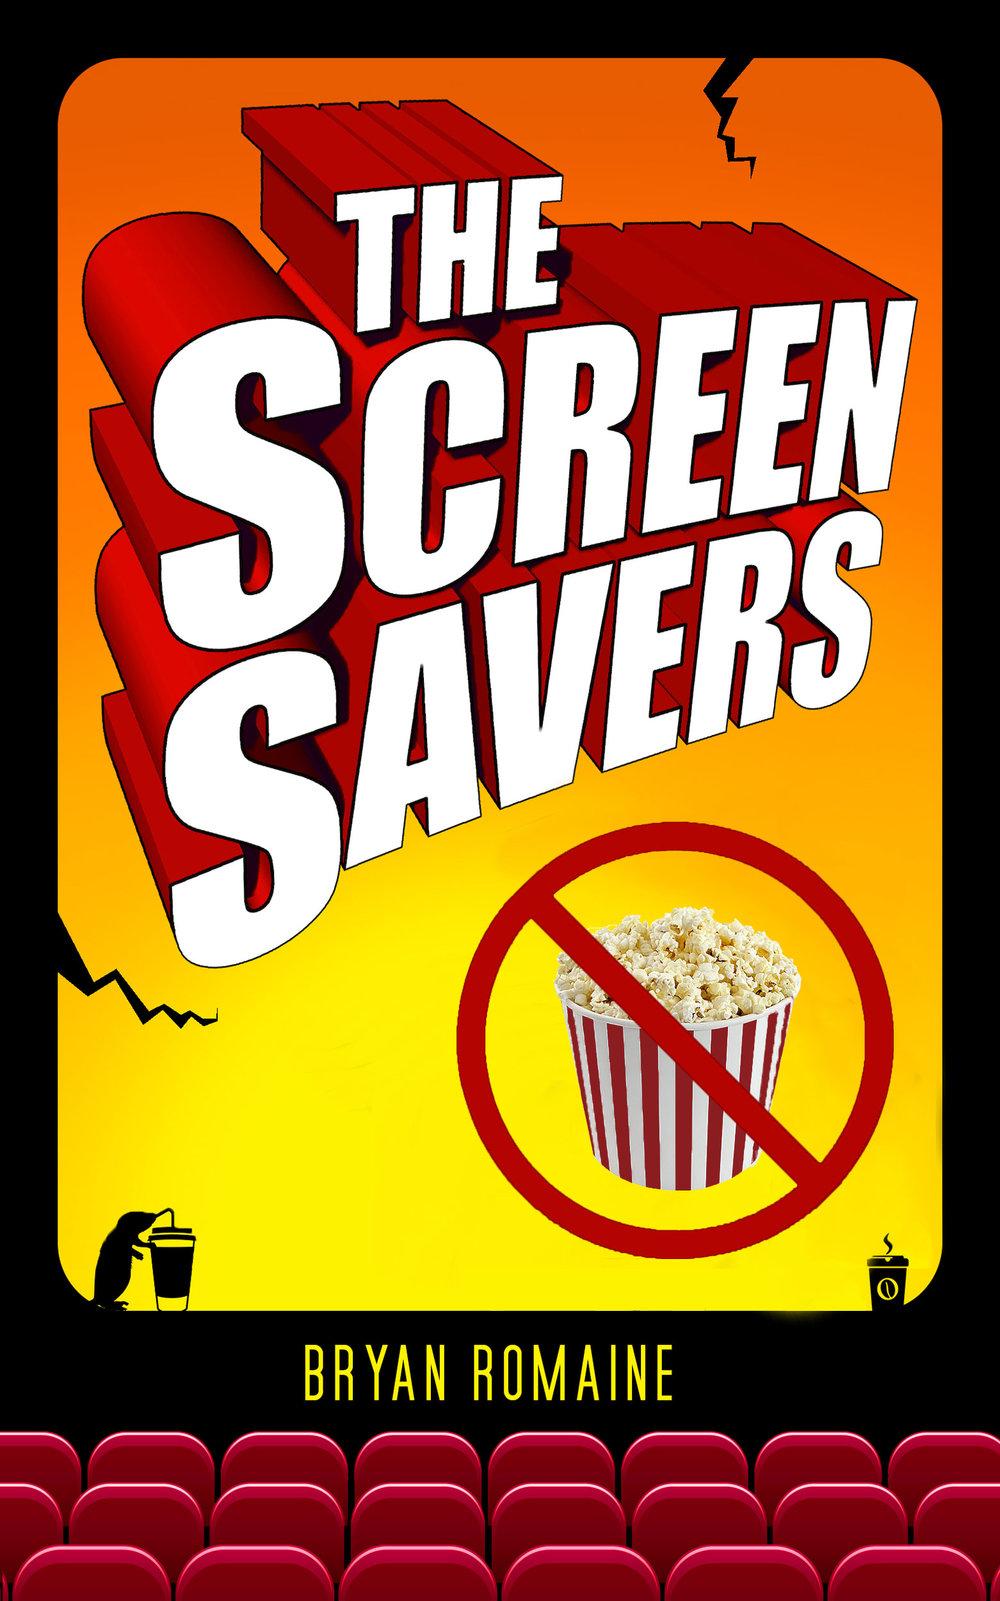 Original-Screen-Savers-No-Popcorn-Final-tidy1-sfw.jpg